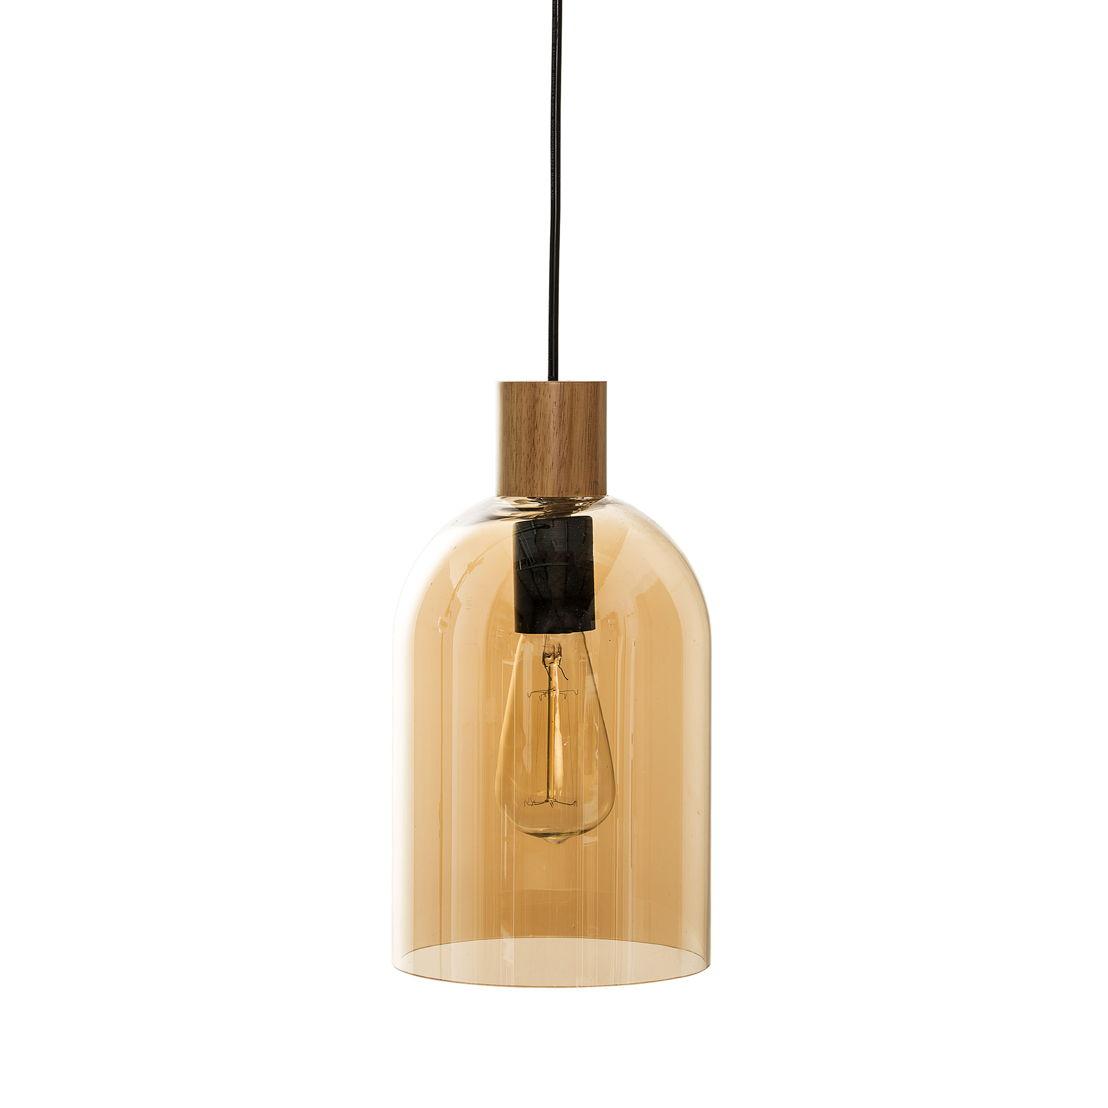 Bloomingville Hanglamp bruin glas lang - €217,50